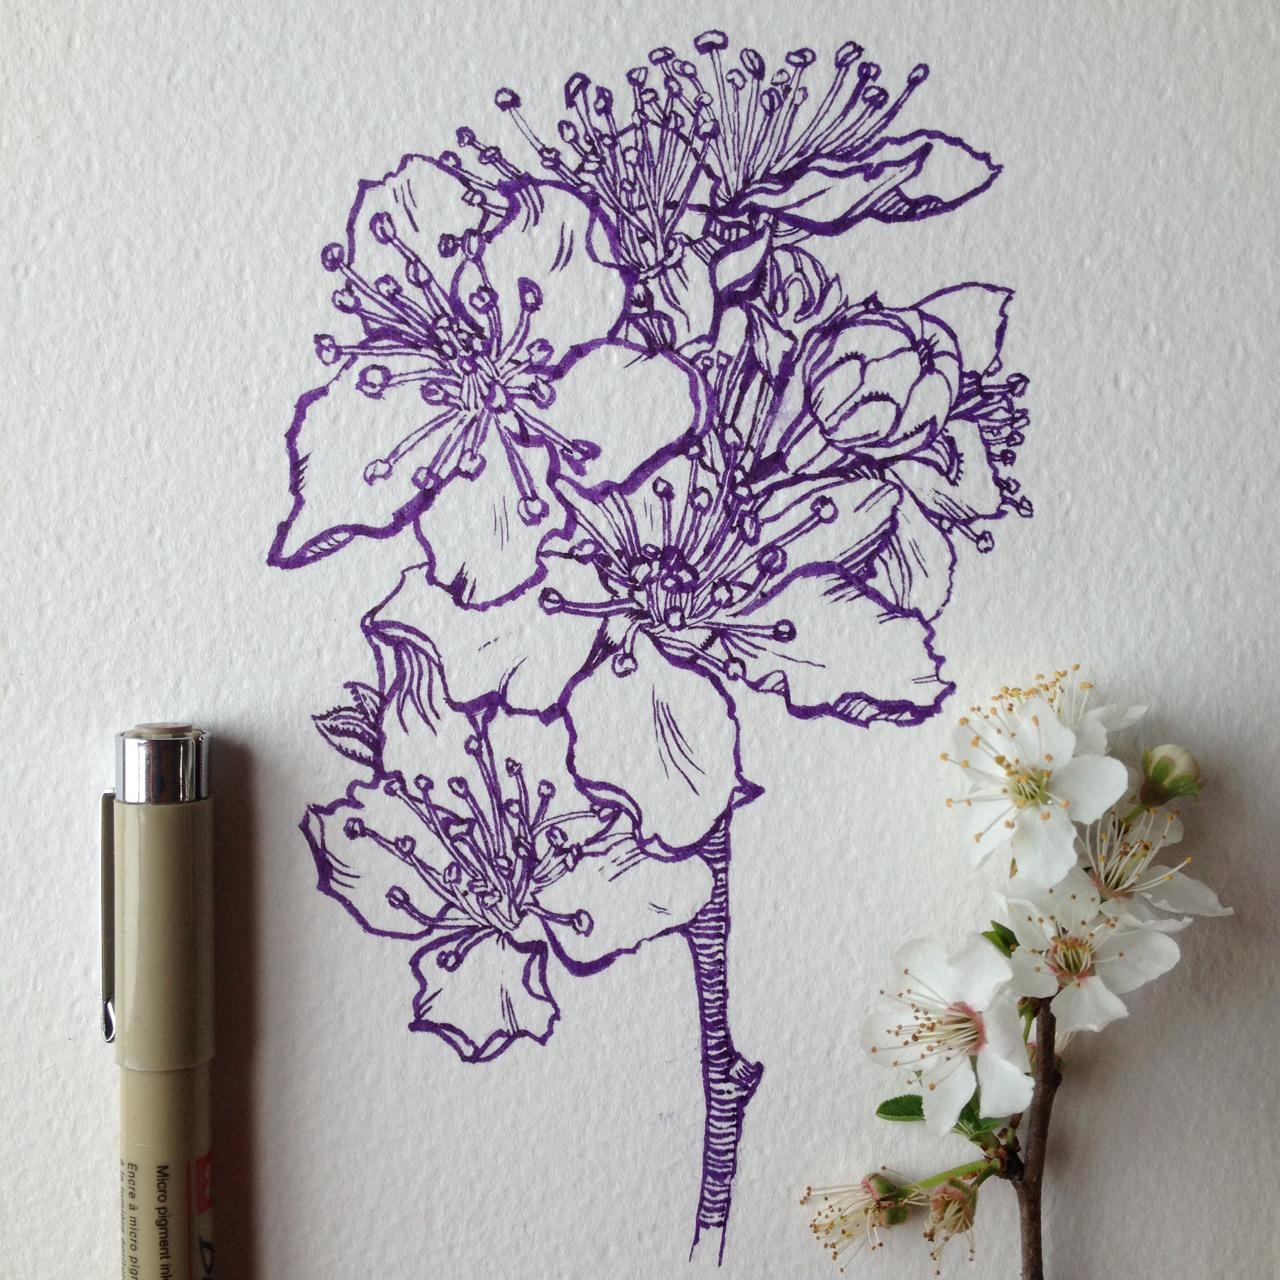 Drawn sakura blossom pen Best cherry sketch pen Find